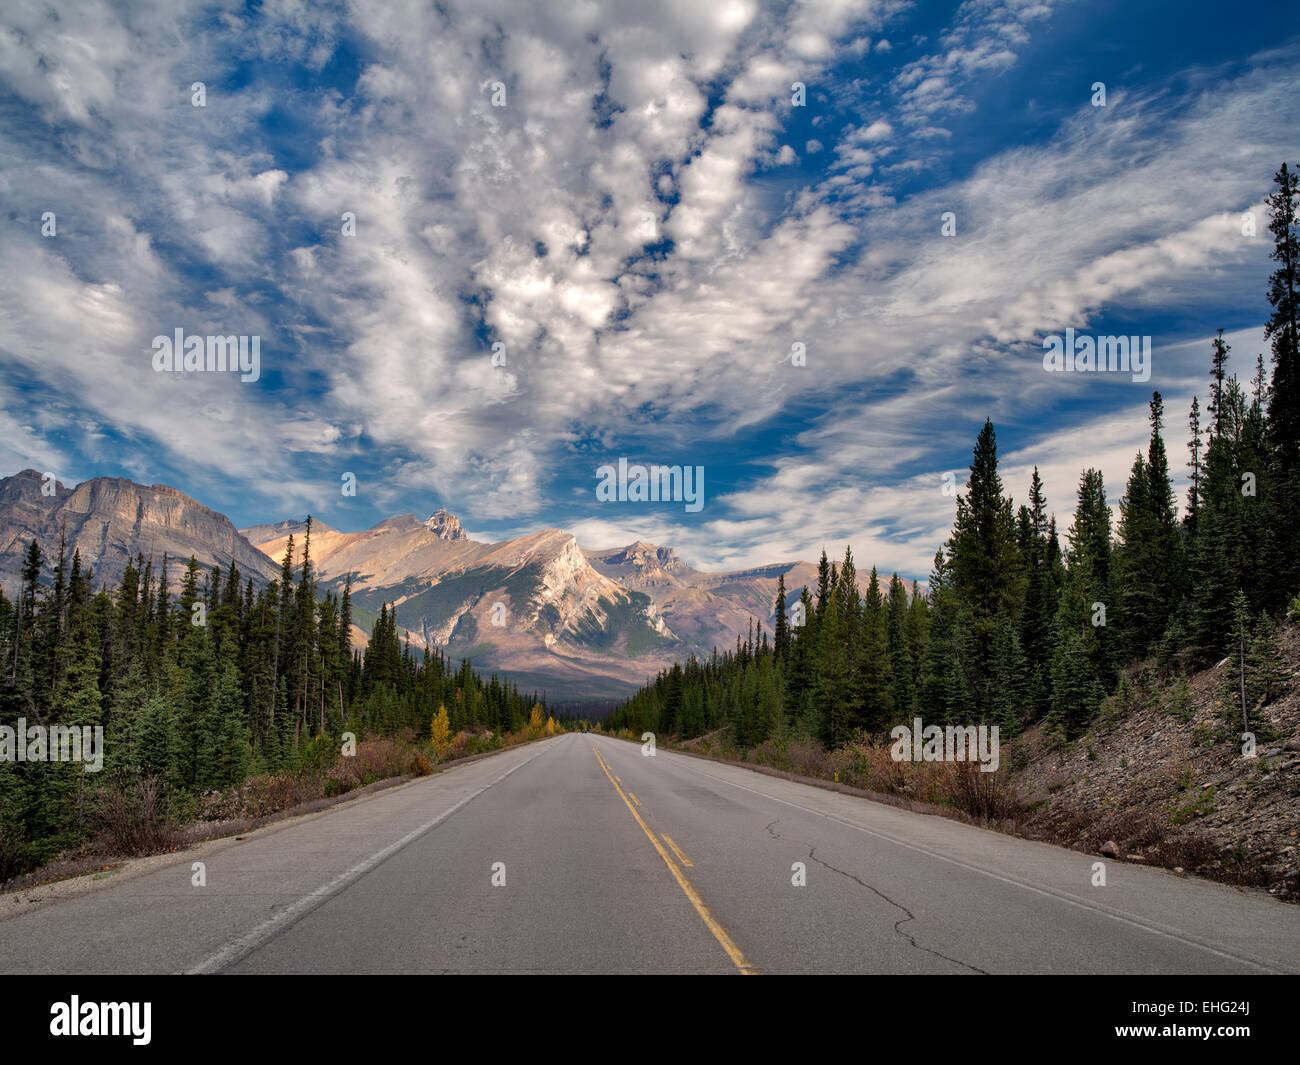 Road in Banff National Park, Alberta, Canada - Stock Image